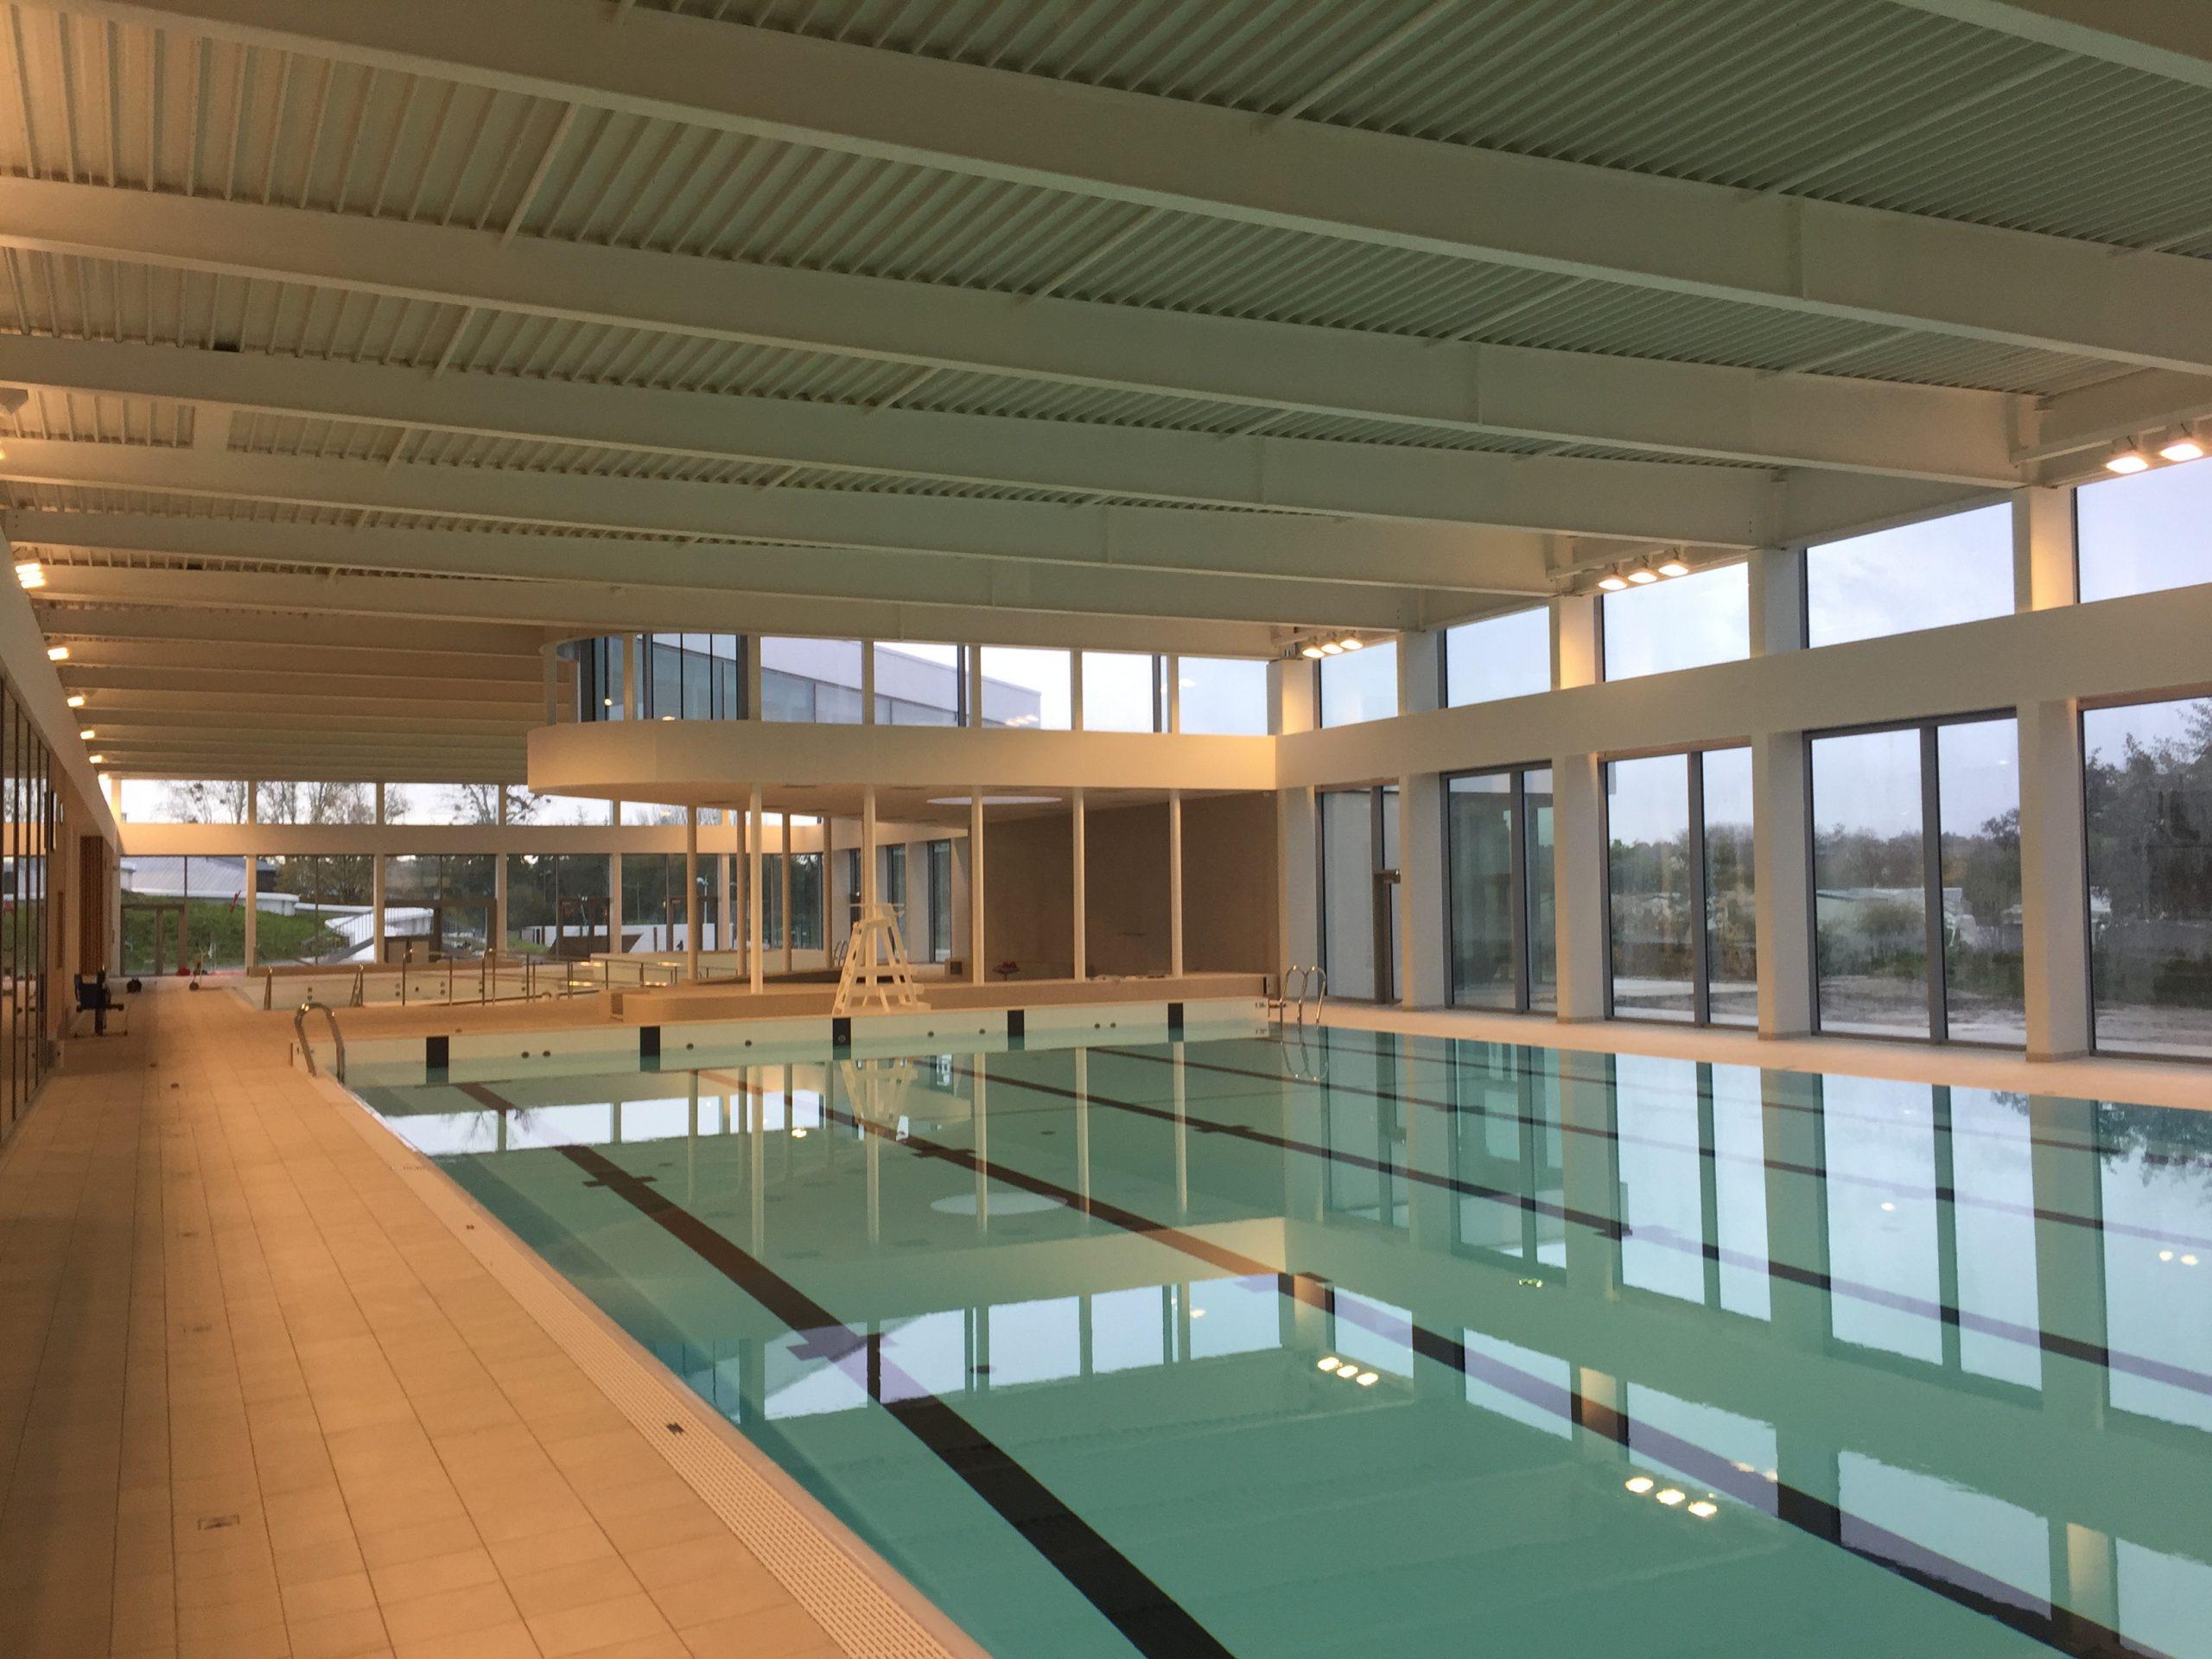 Home - Centre Aquatique Dolibulle - Dol De Bretagne - Dolibulle serapportantà Piscine Dolibulle